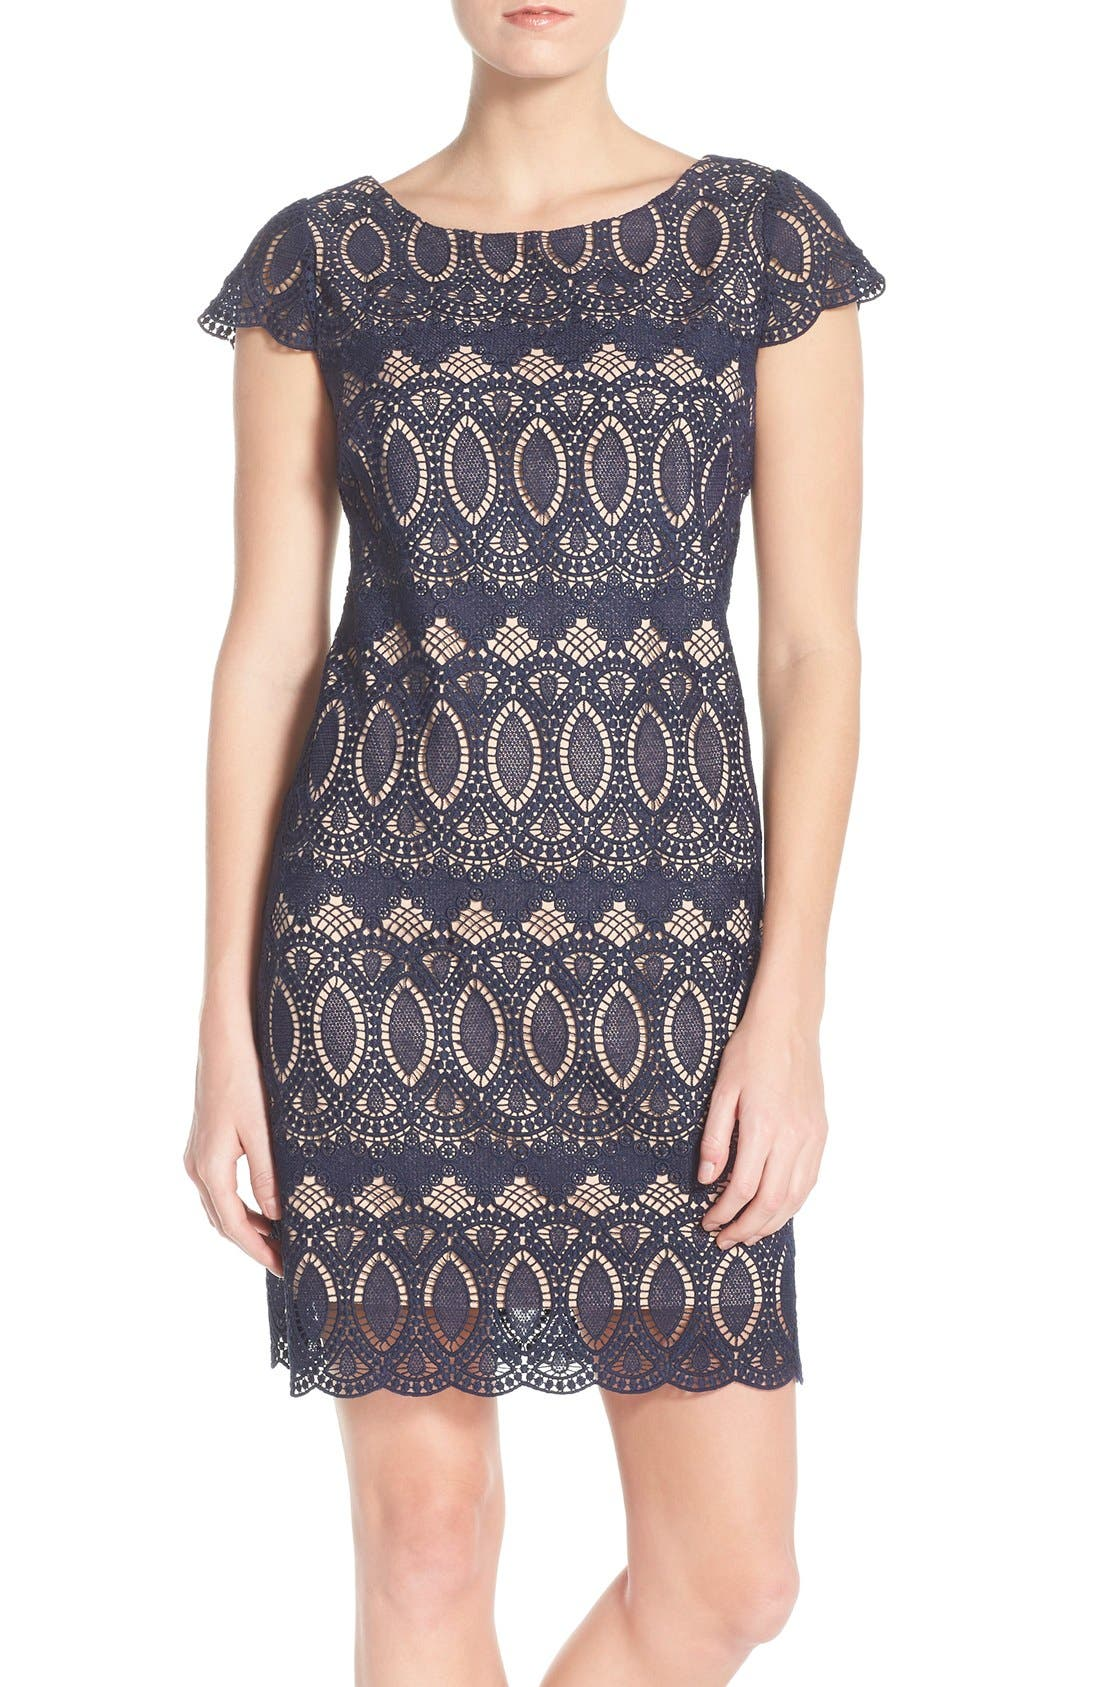 Alternate Image 1 Selected - Eliza J Scalloped Lace Sheath Dress (Regular & Petite)